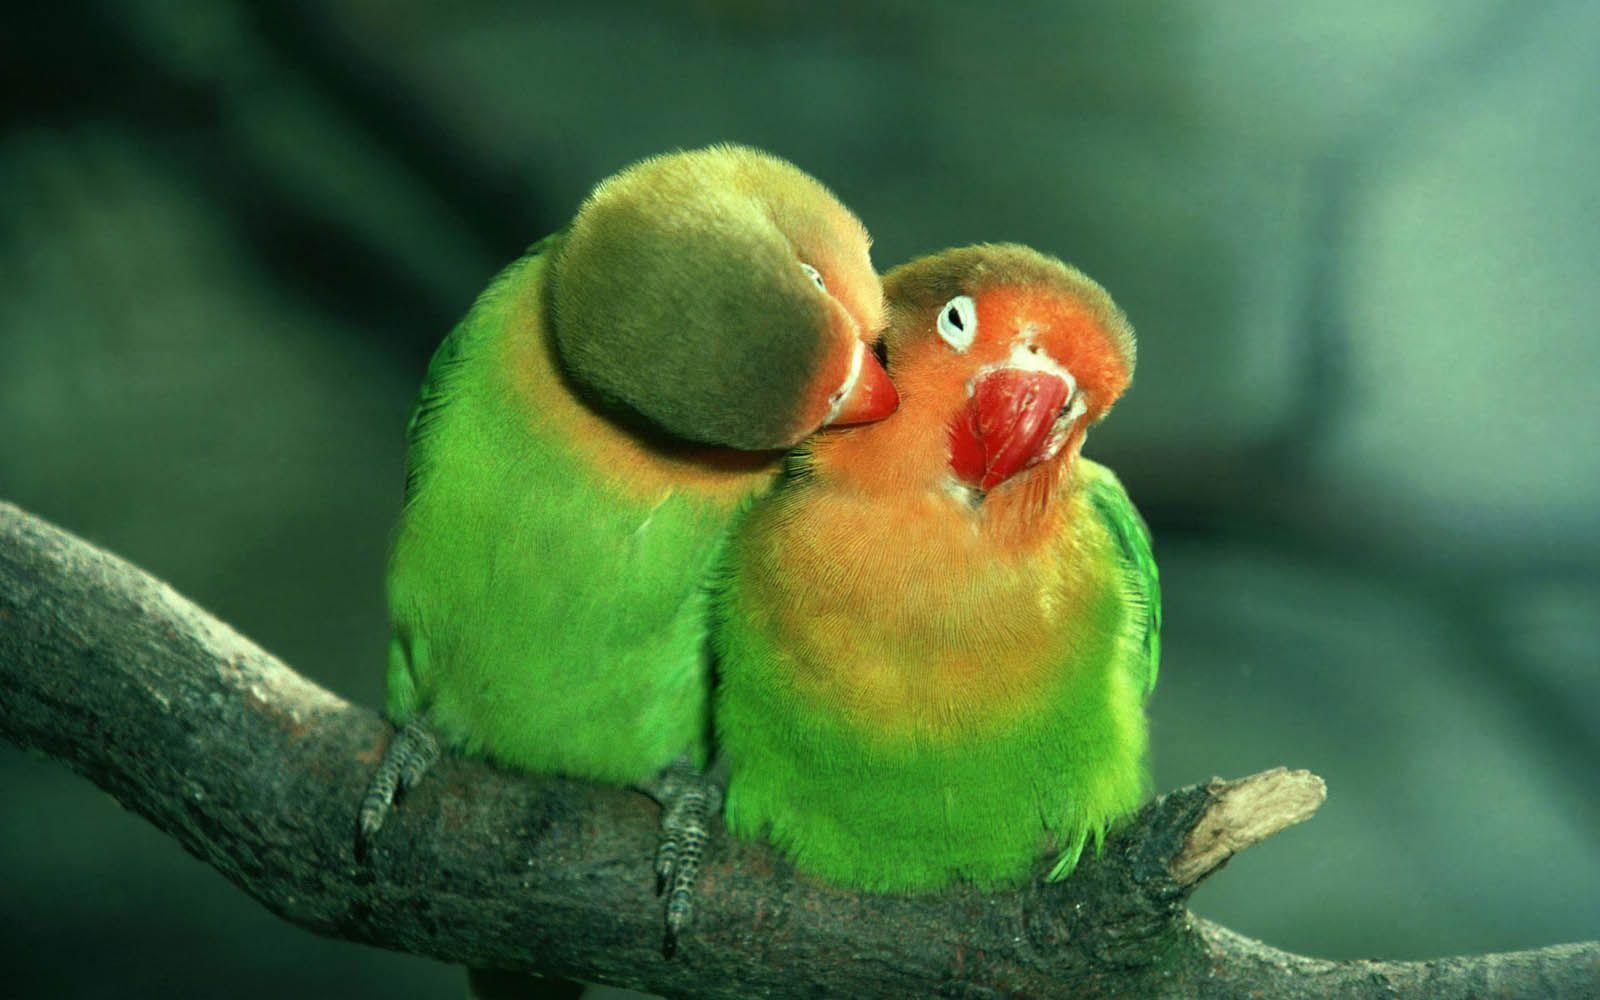 Romantic Love Romantic Love Birds Pictures Romantic Love Birds Pictures Pet Birds Beautiful Birds Birds